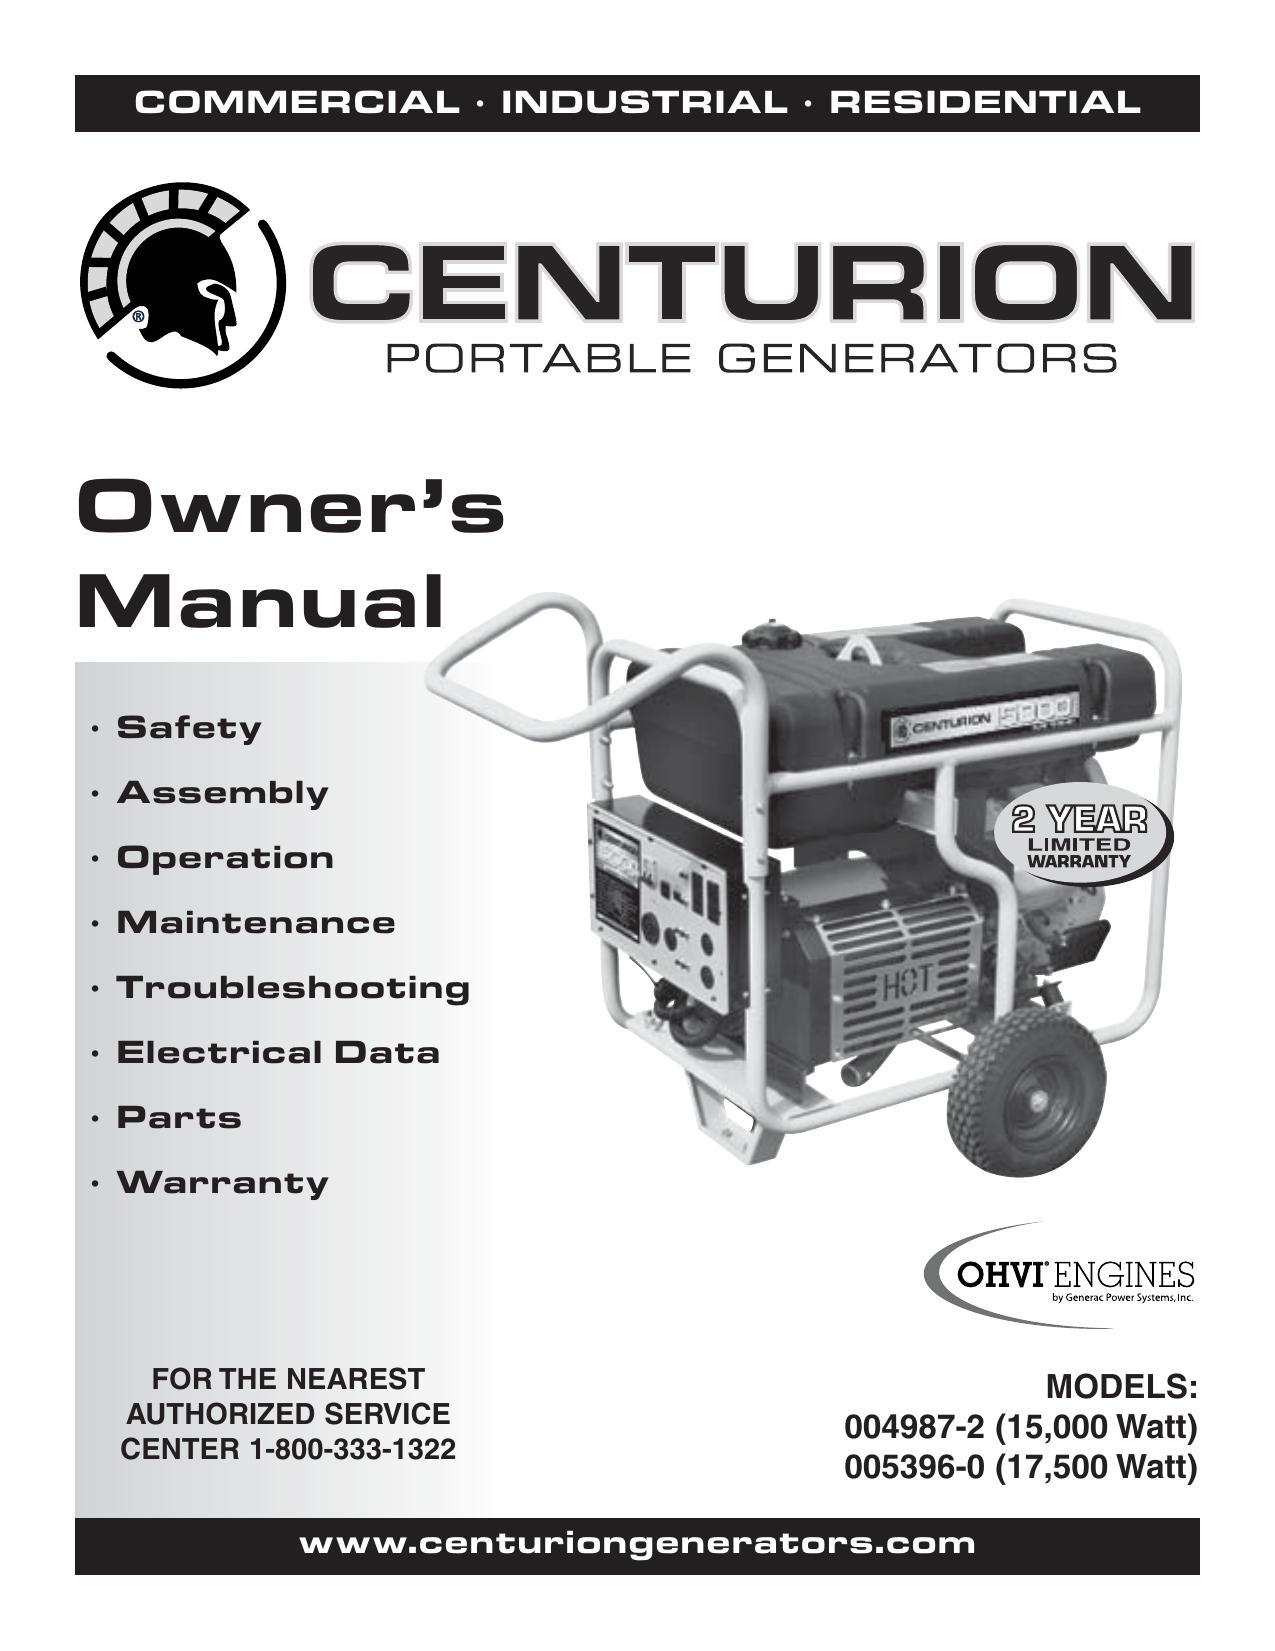 Generac Centurion 15000 0049872 Manual | Manualzz | Generac 15000 Portable Generator Wiring Diagram |  | Manualzz